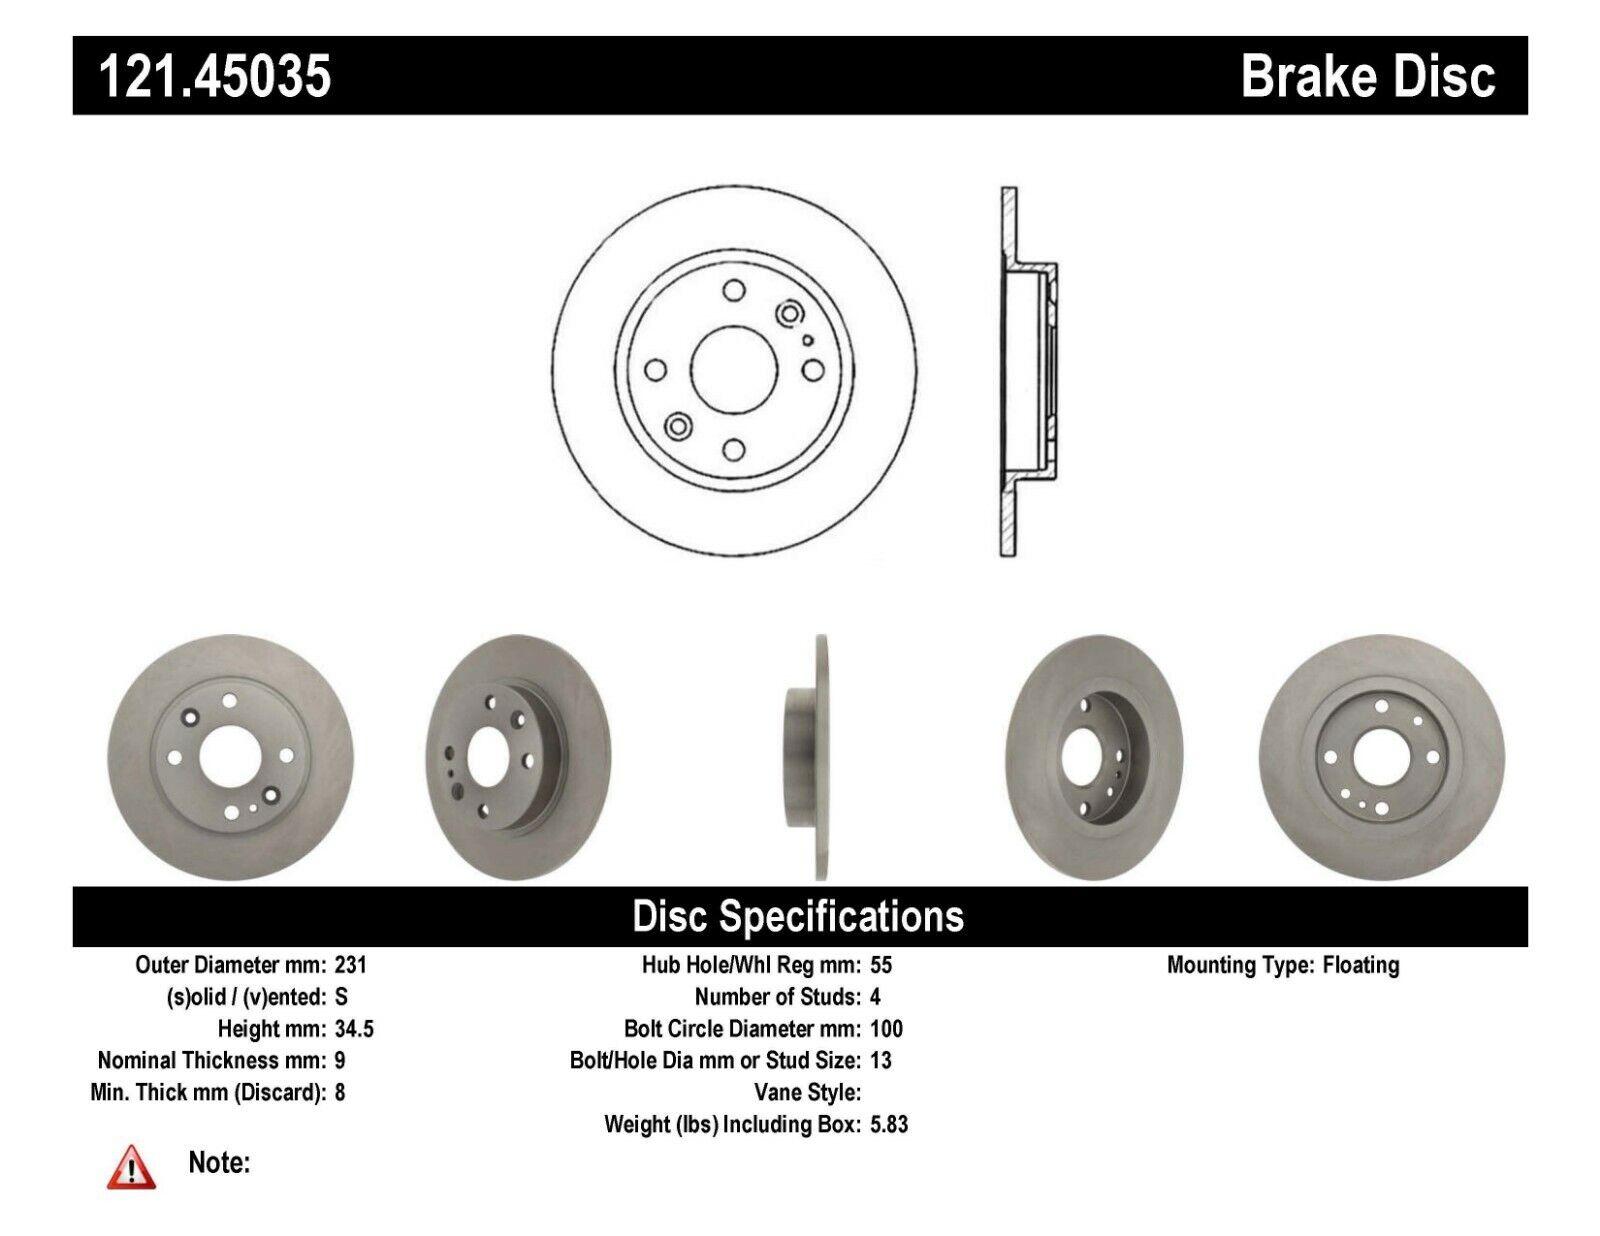 Centric Brake Disc Rear Driver or Passenger Side New RWD RH 121.45035